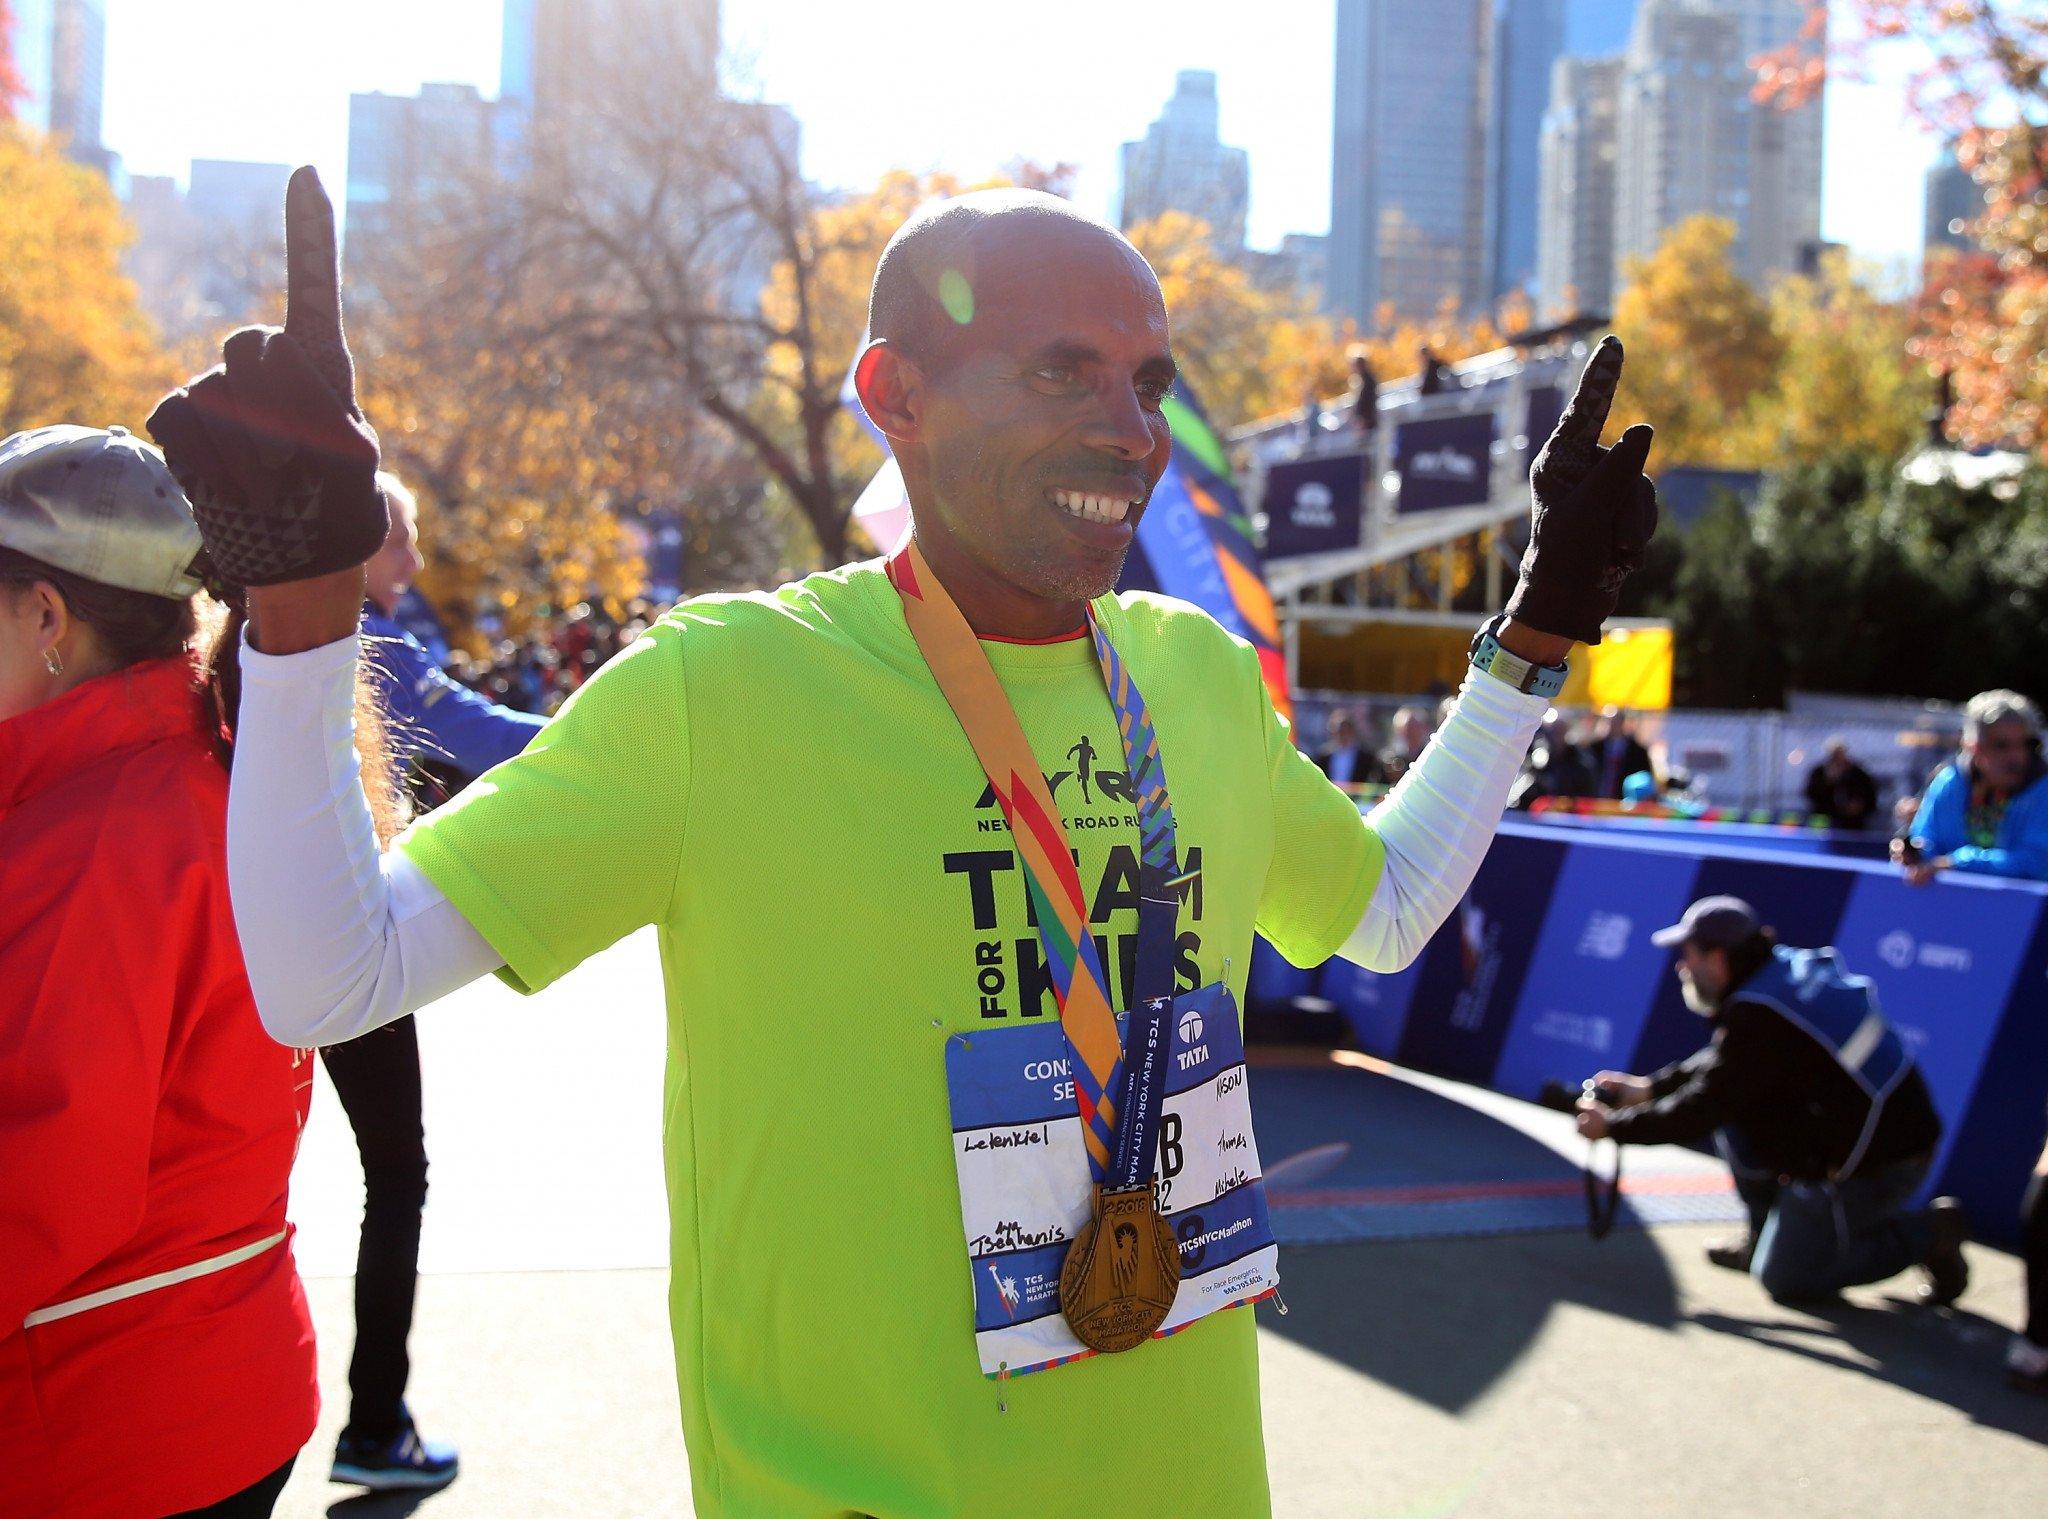 New York City Marathon's cancellation sees virtual race take centre stage